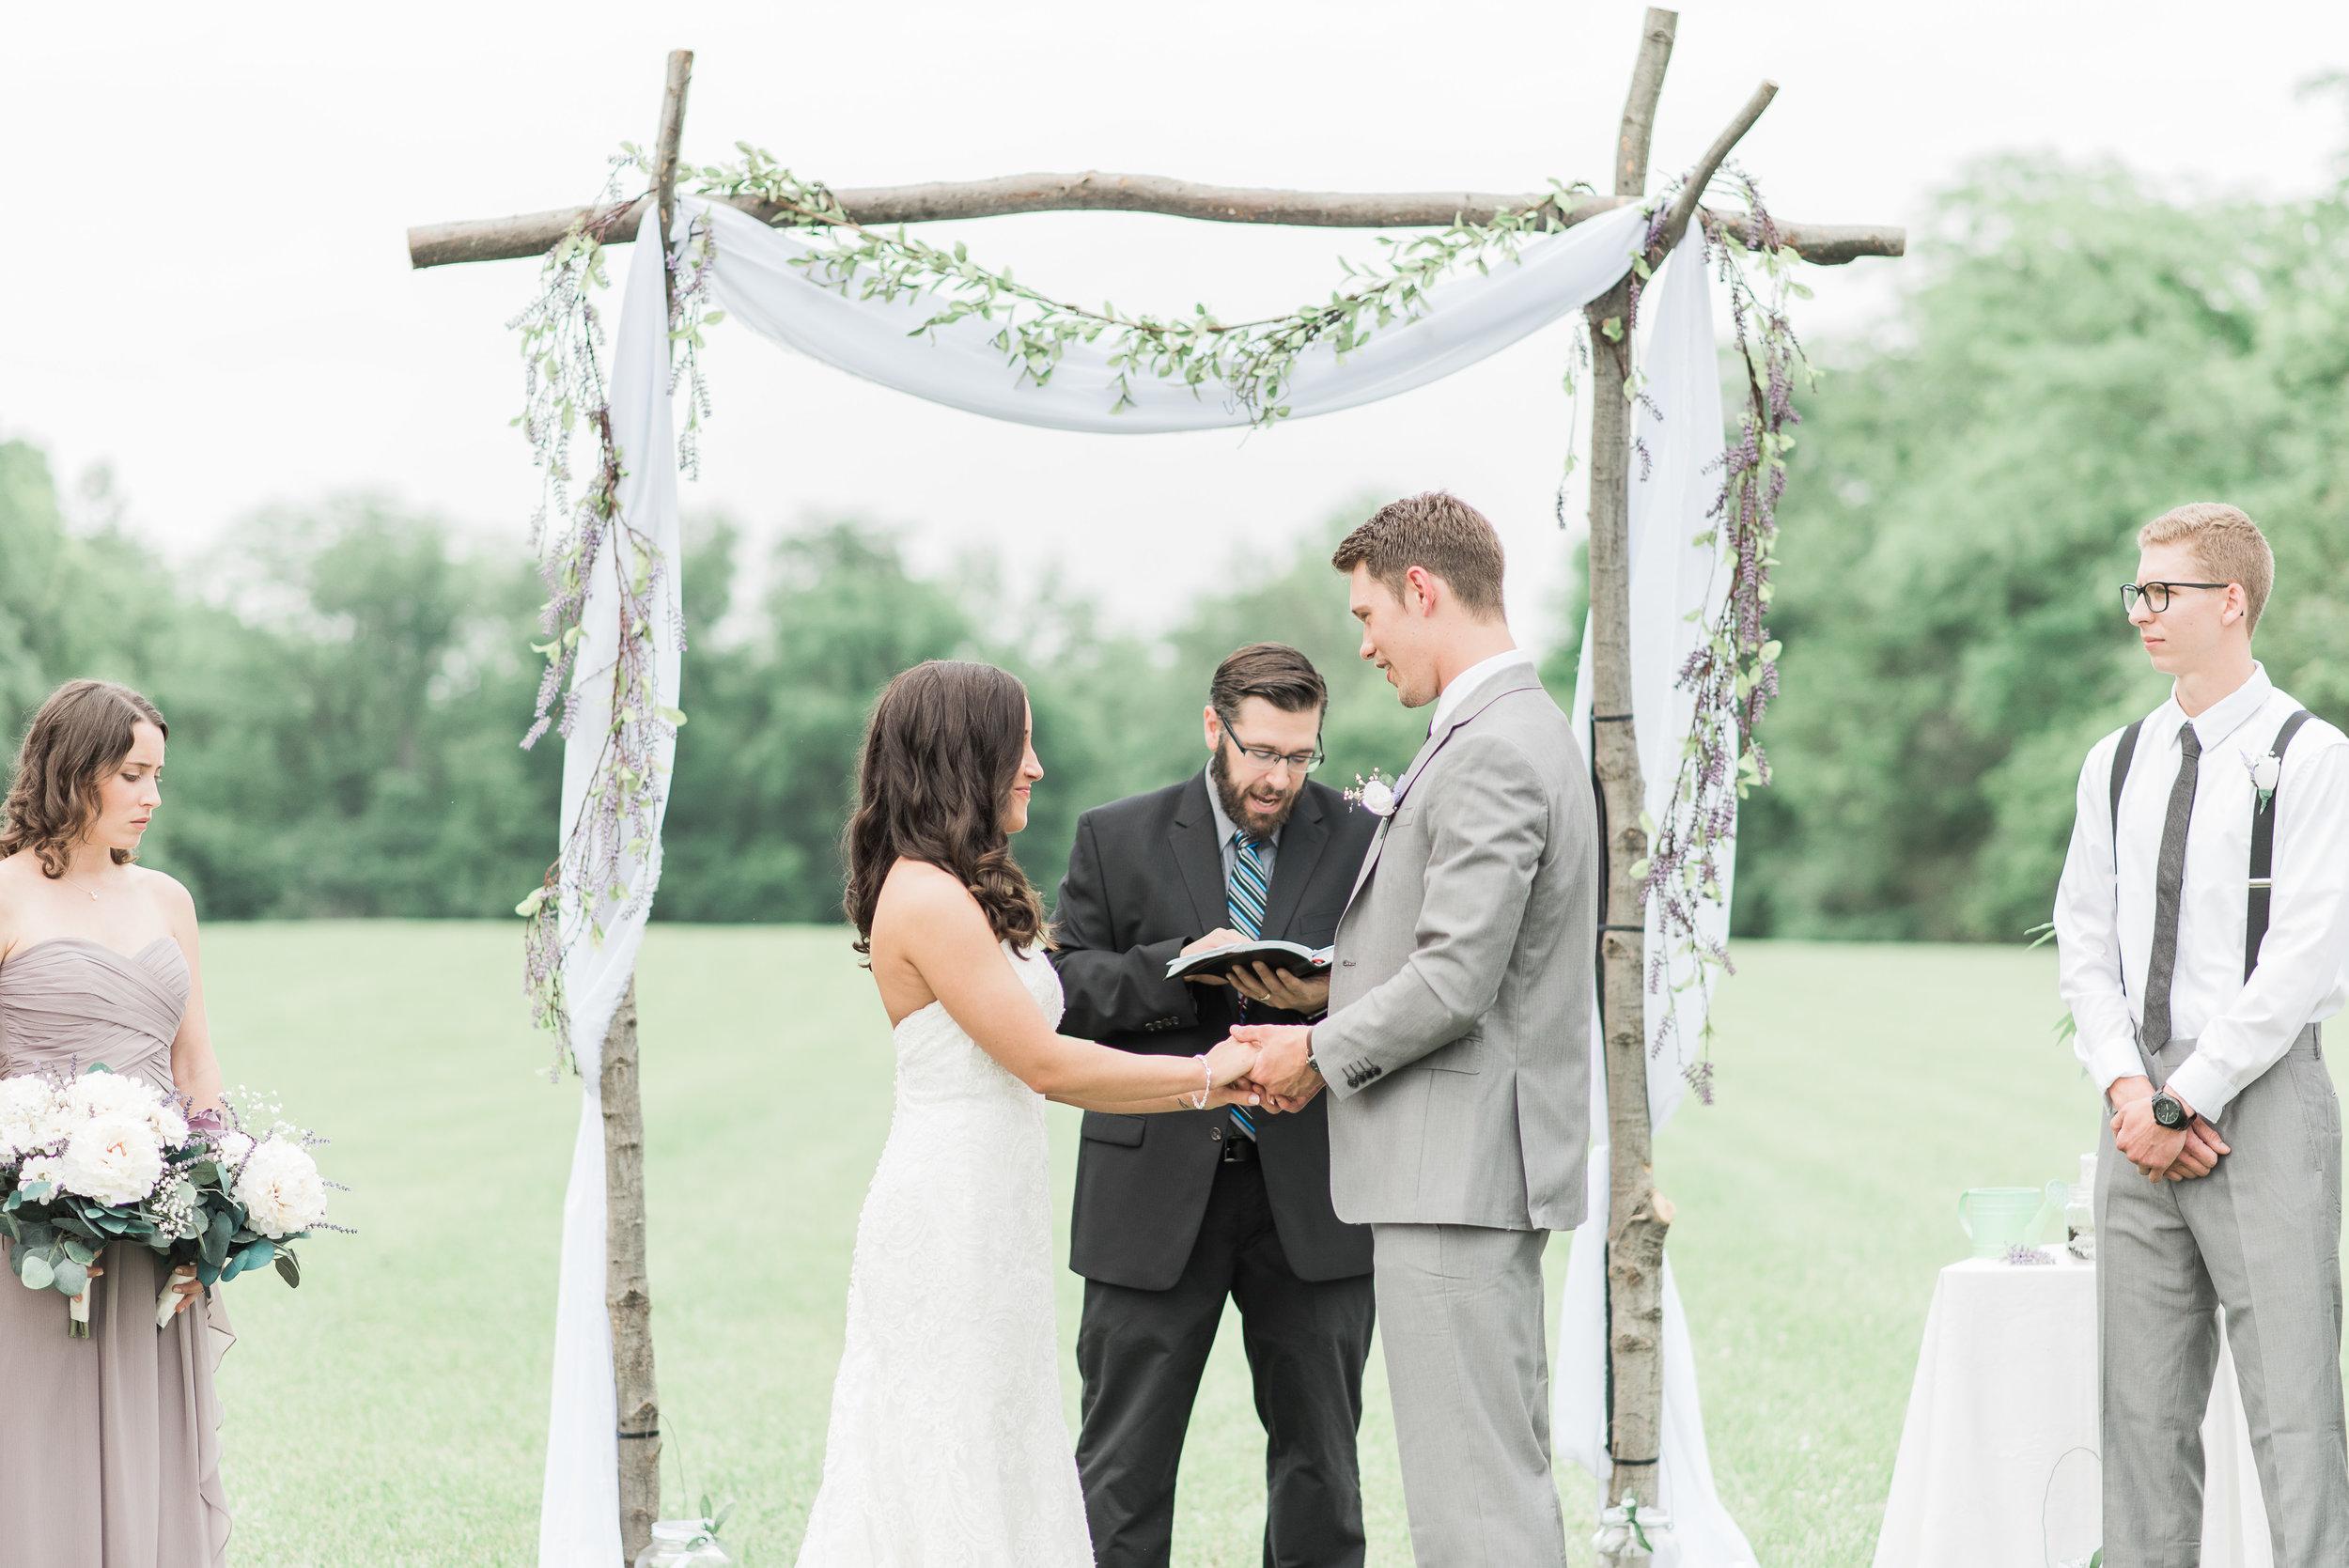 sarah-marcus-married-208 copy.jpg